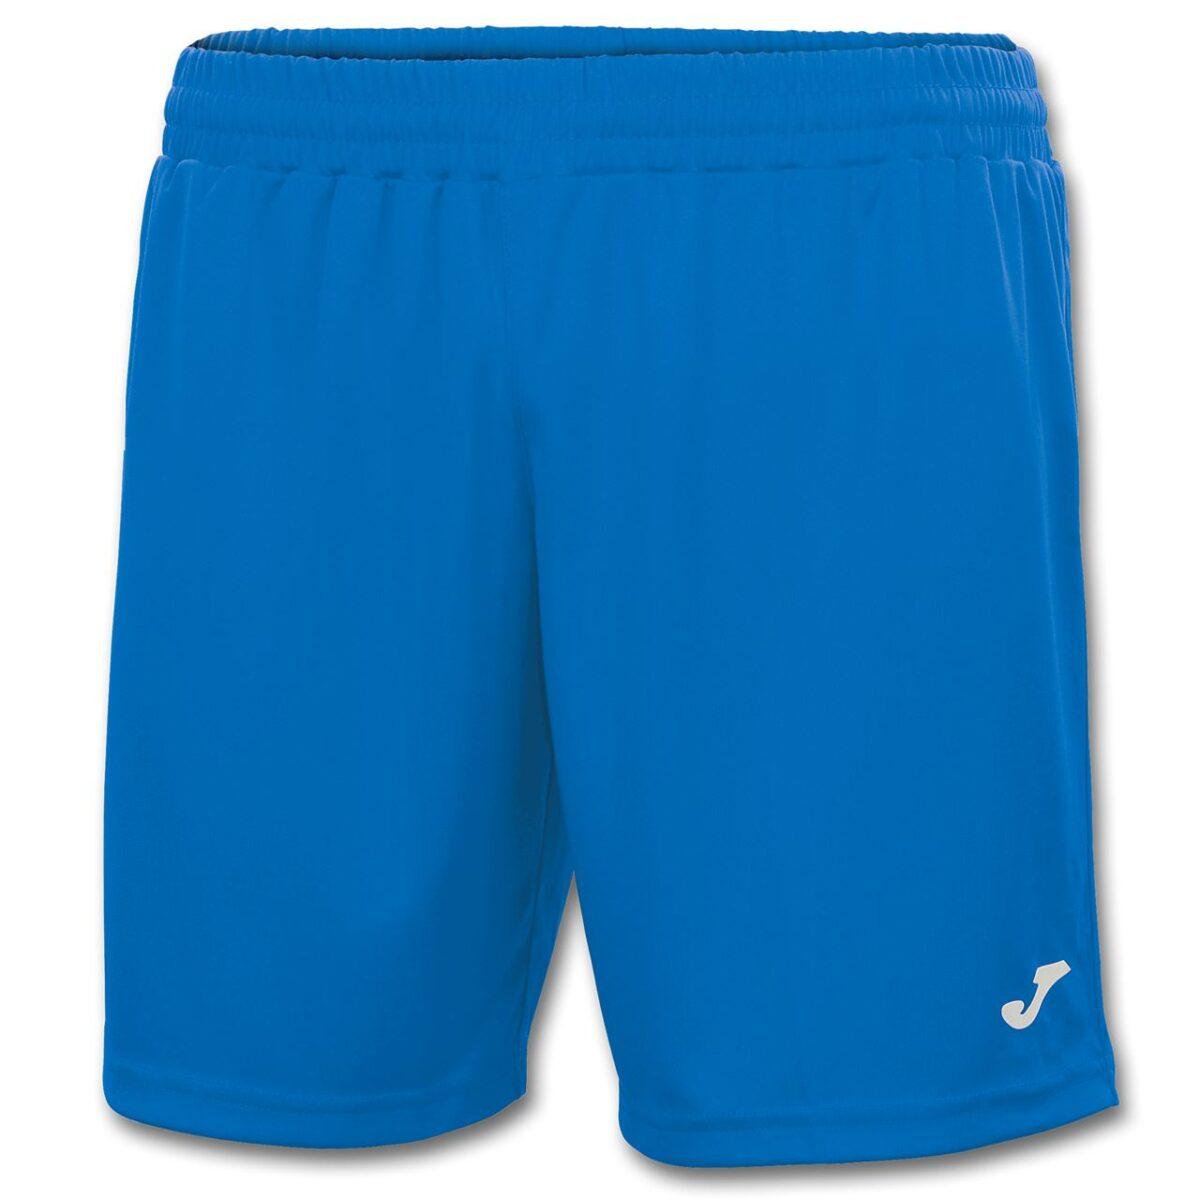 Joma Treviso Volleyball Shorts 100822 - Adult.